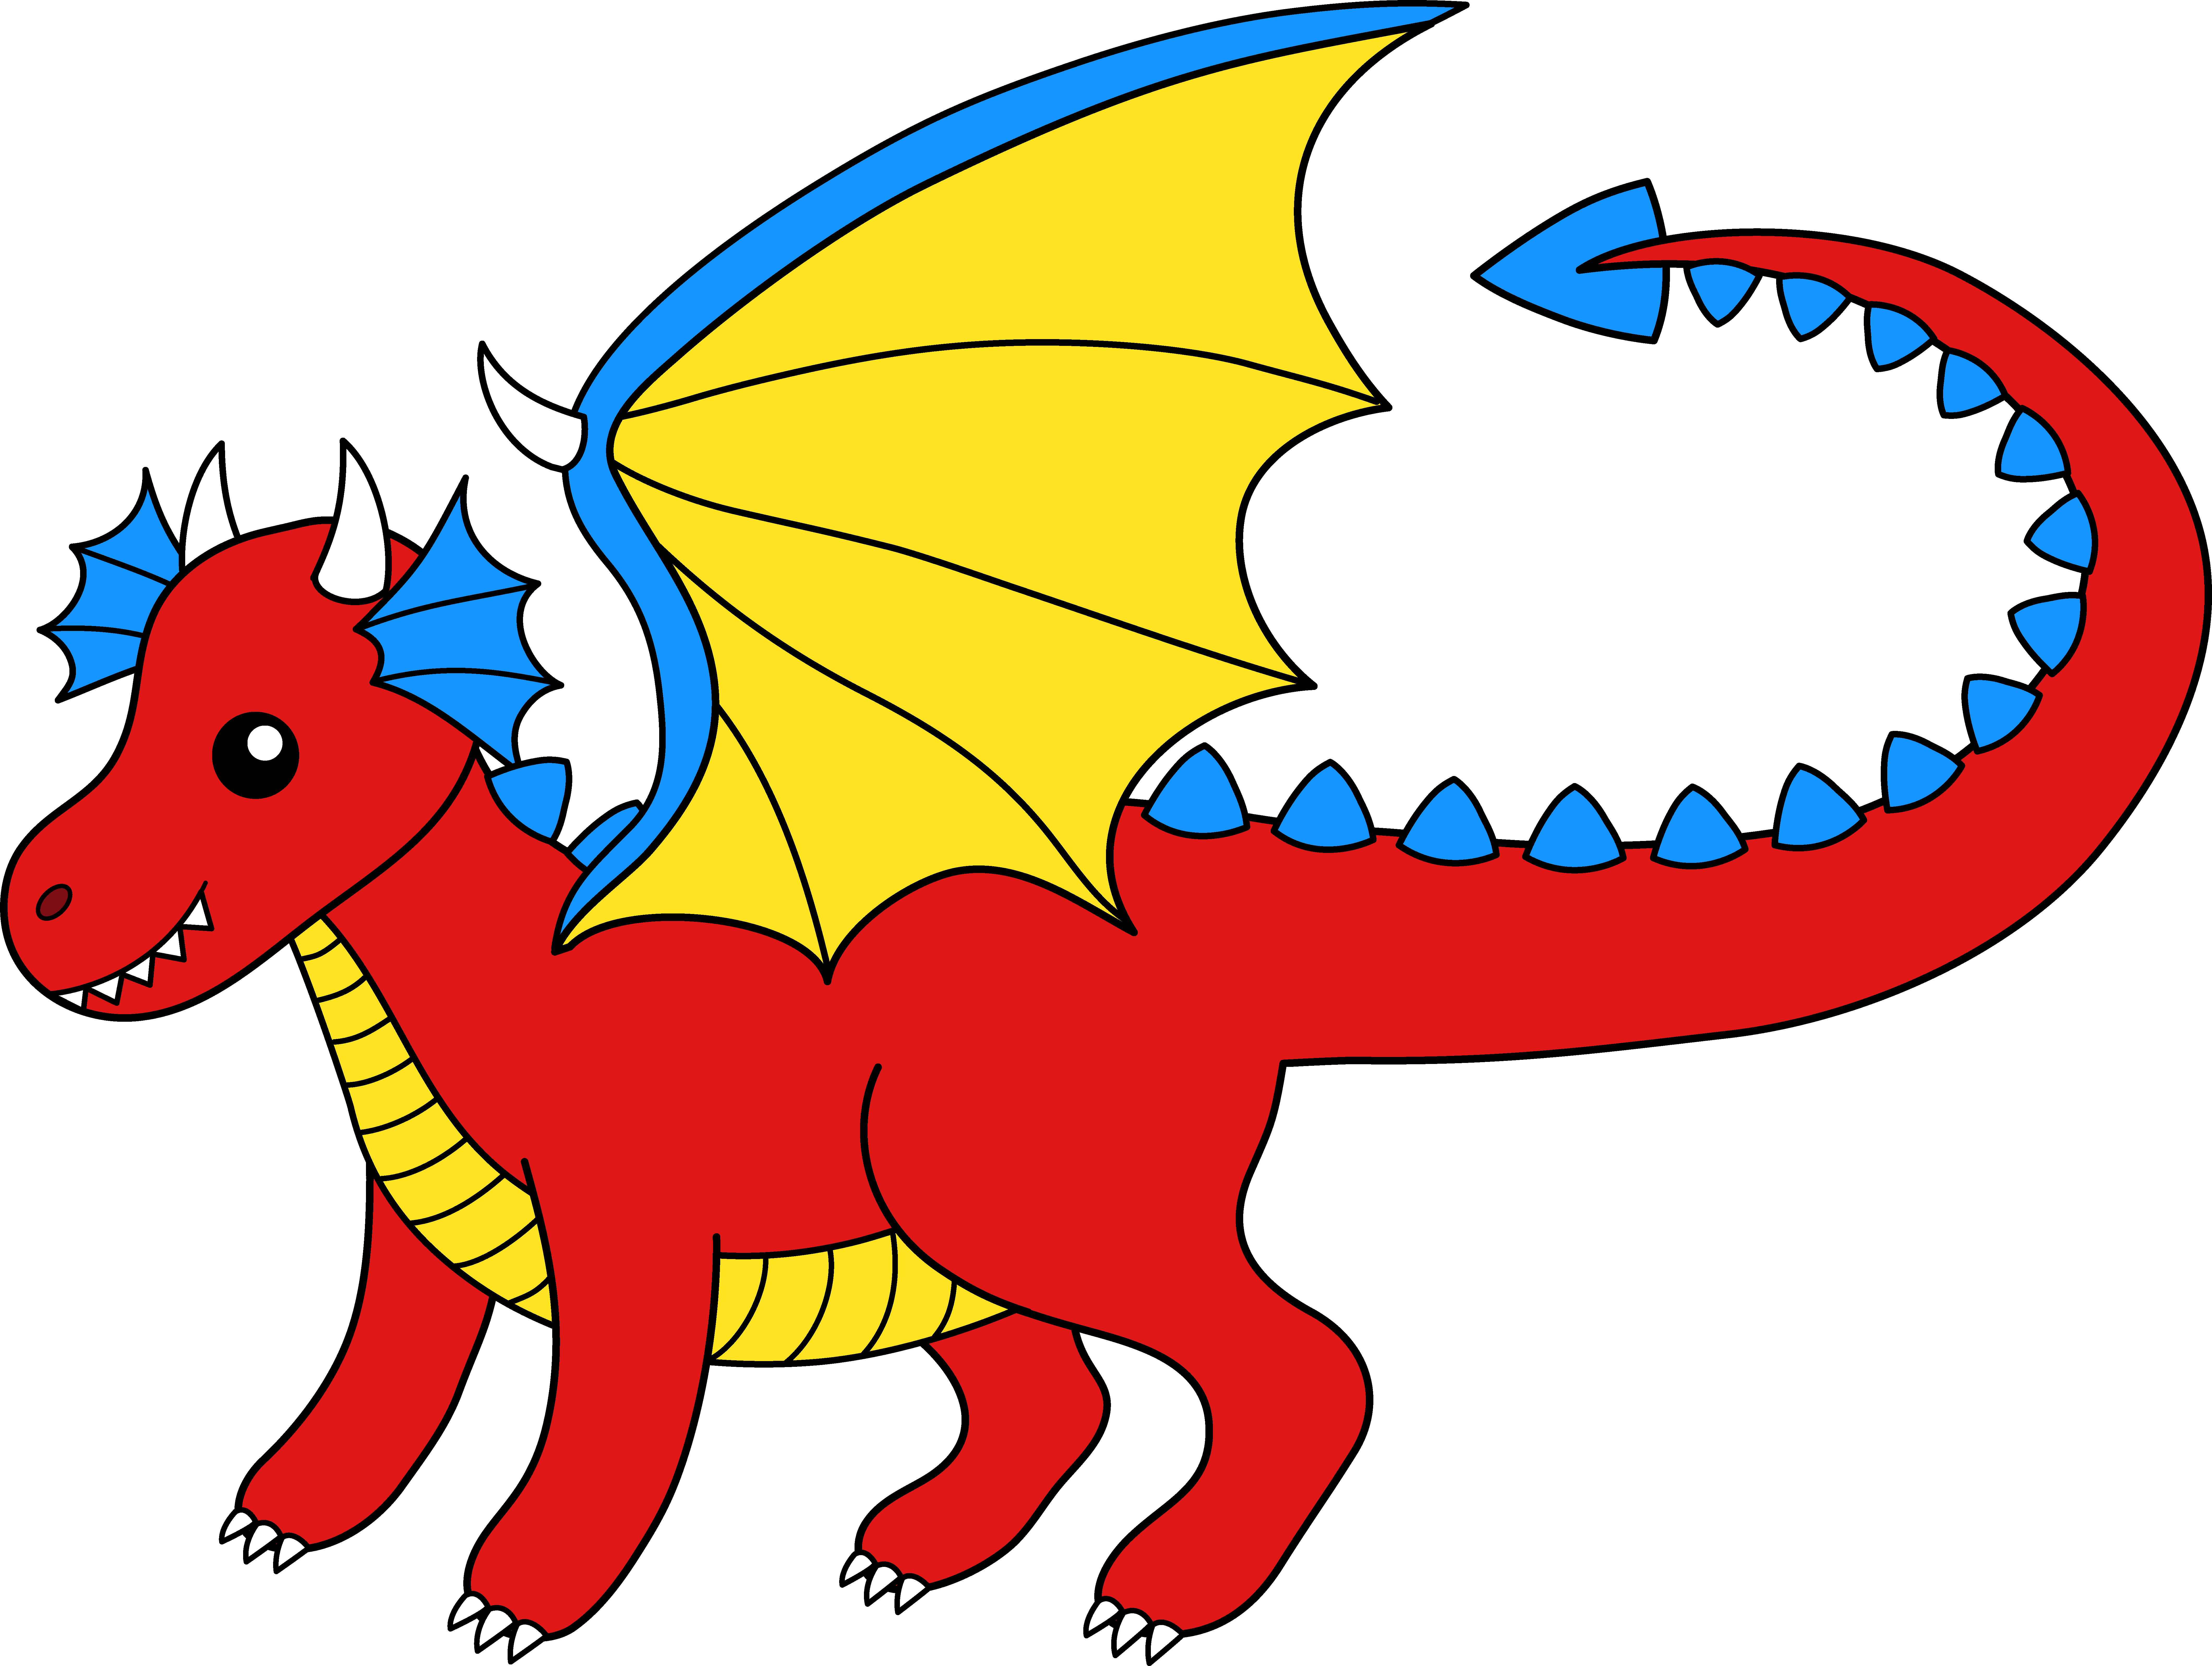 Free dragon clipart kids jpg black and white download Free Dragon Cliparts, Download Free Clip Art, Free Clip Art on ... jpg black and white download